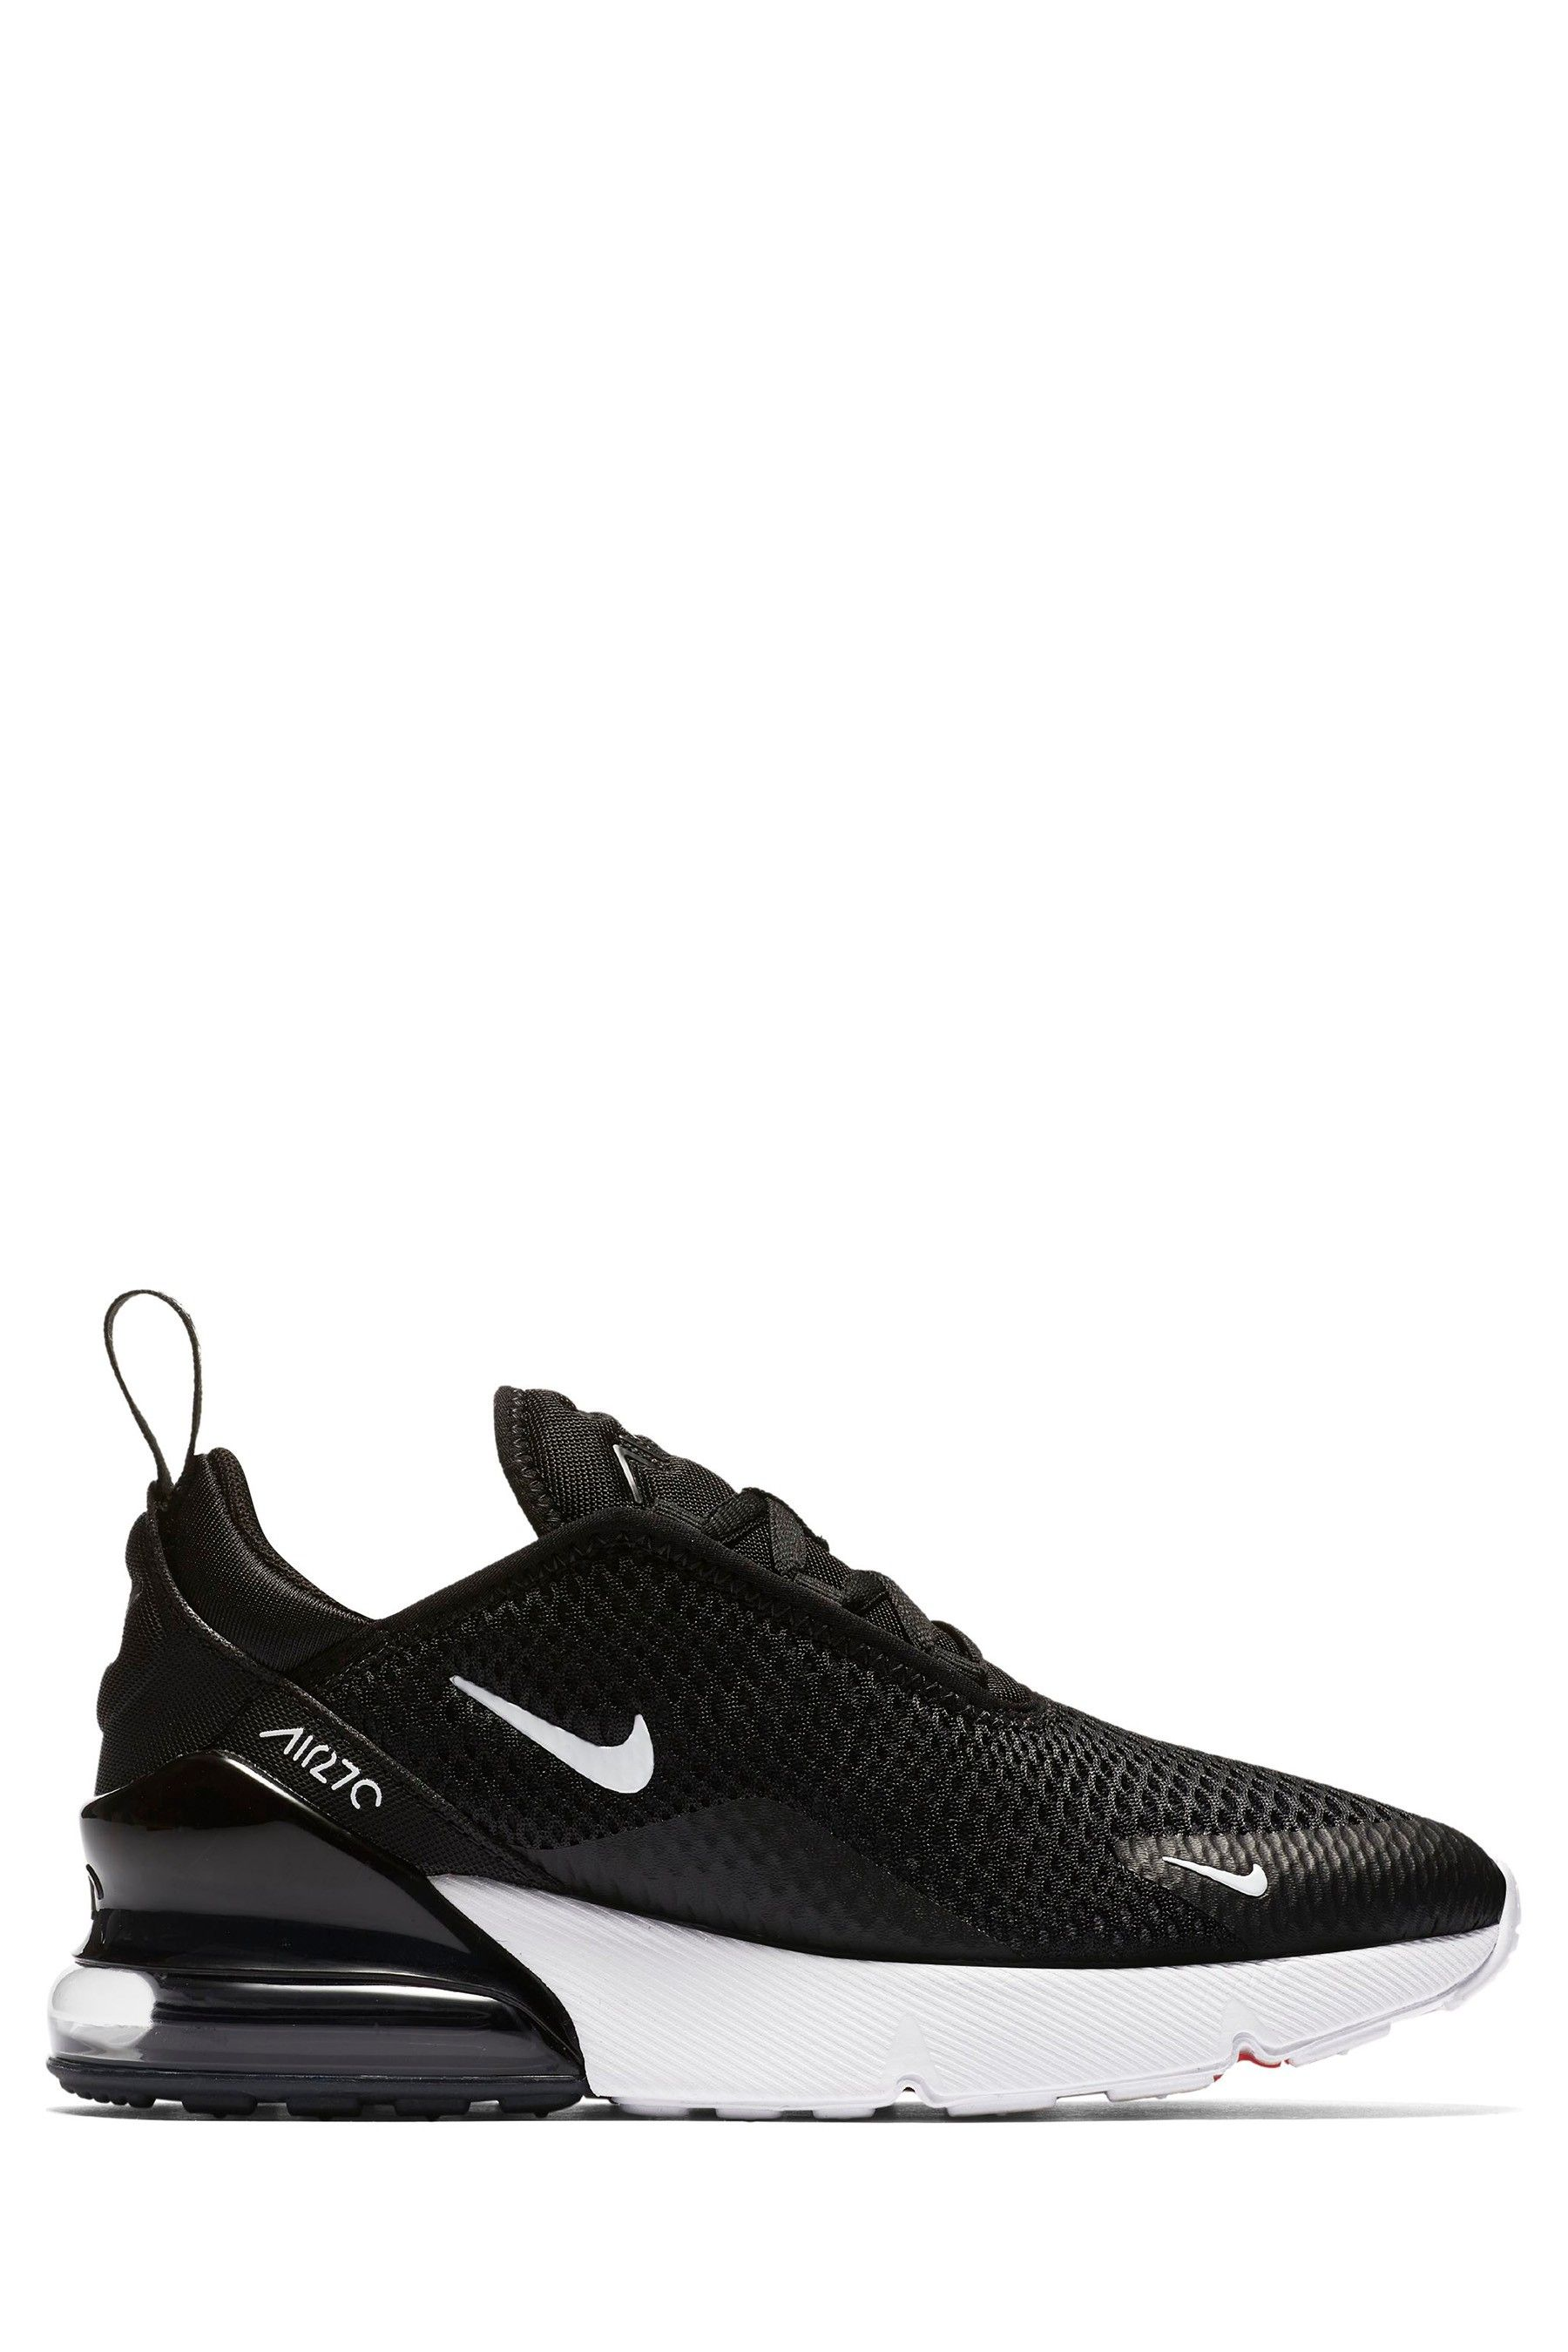 the best attitude 8e46a ed698 Boys Nike Black Air Max 270 Junior - Black | Products in ...